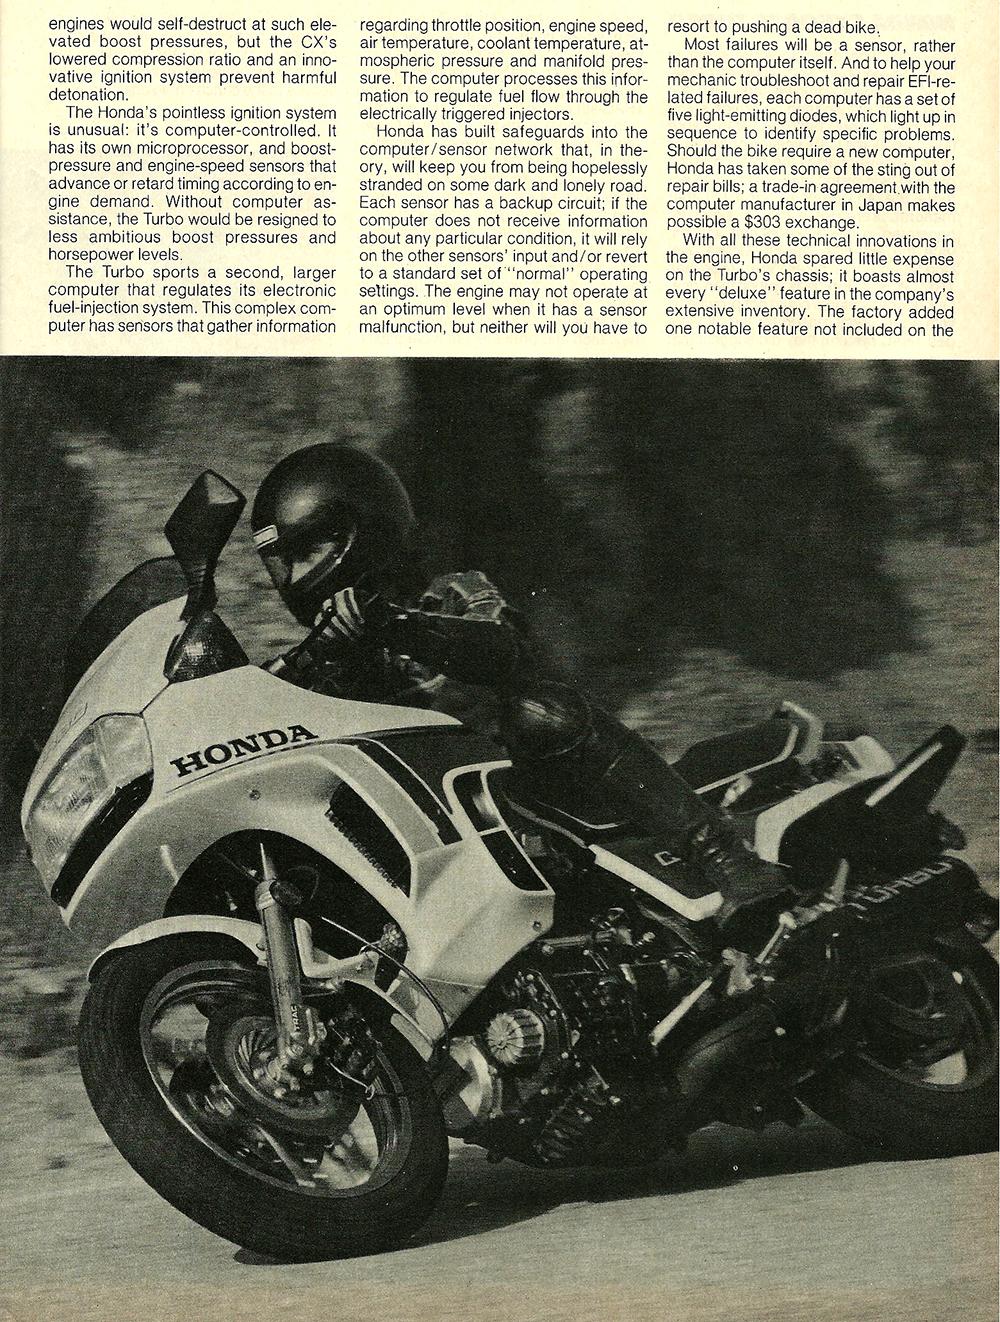 1982 Honda CX500TC Turbo road test 04.jpg